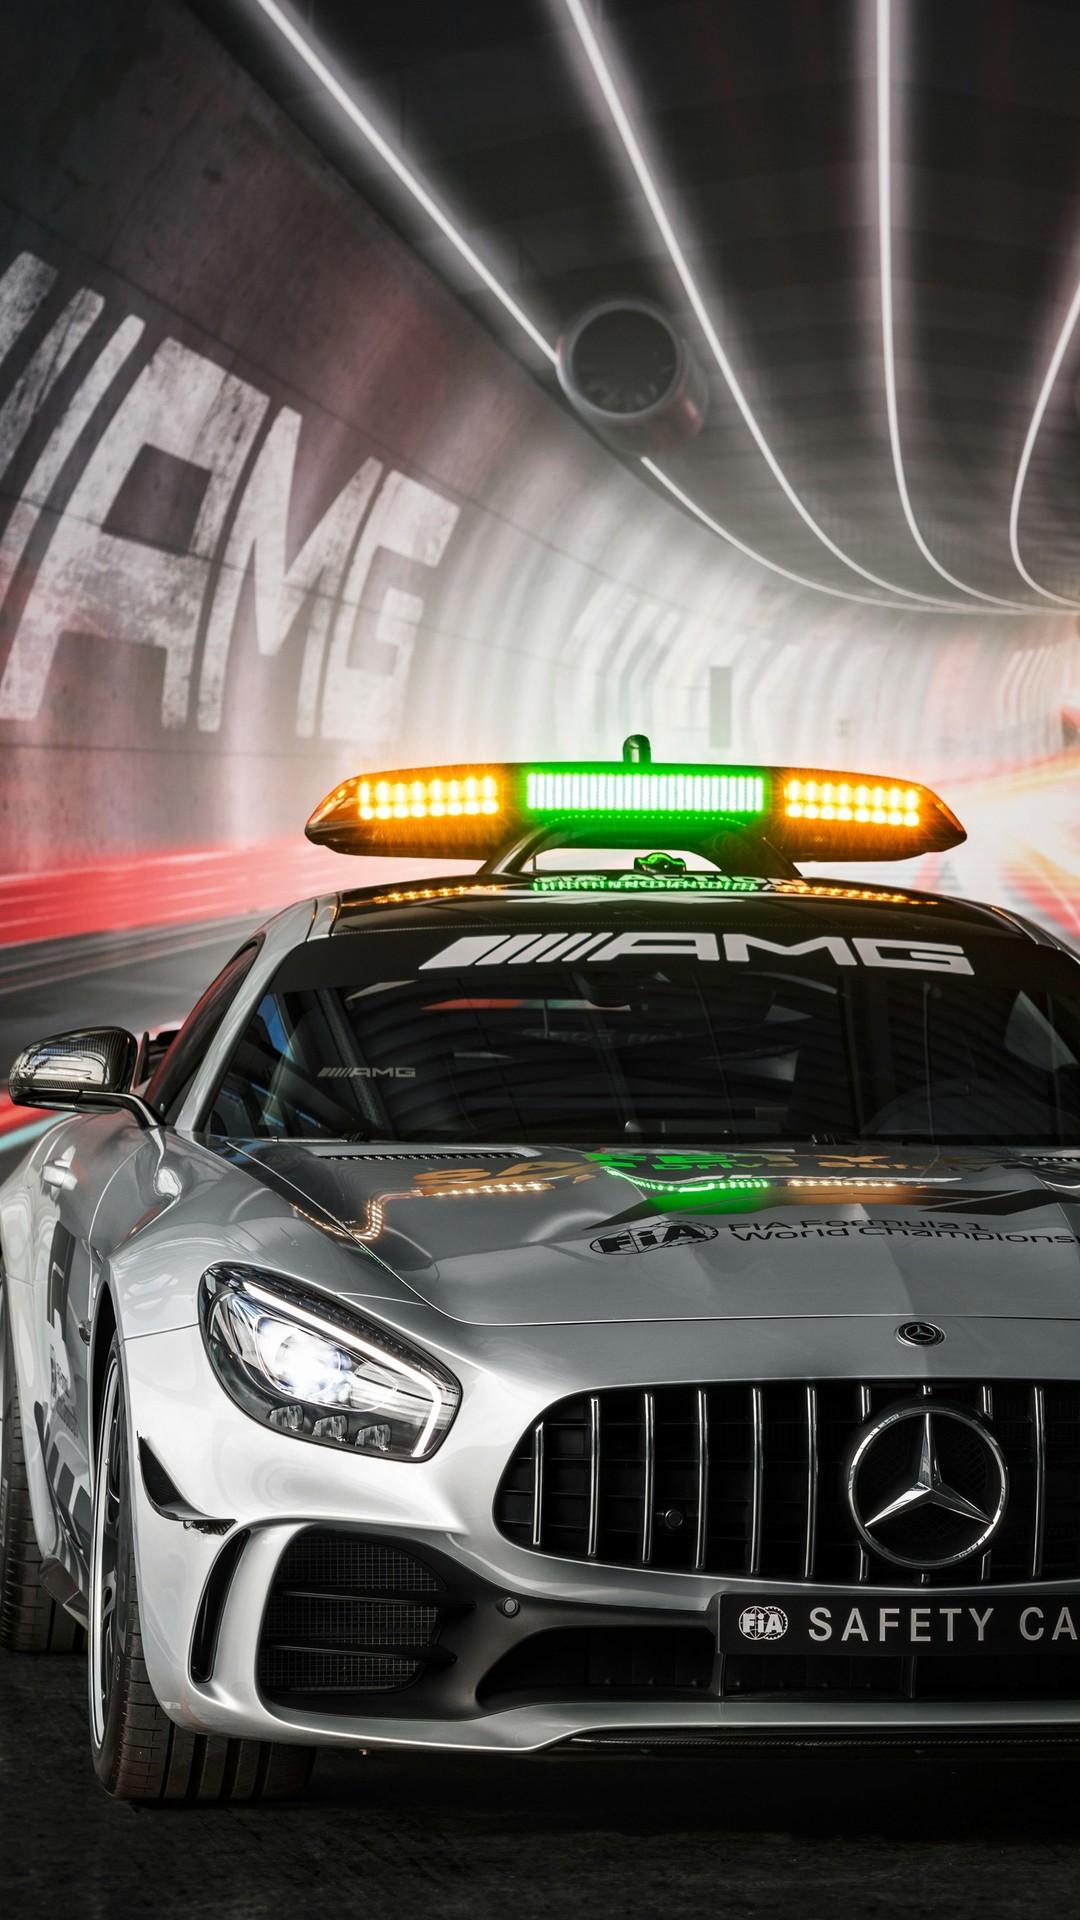 Mercedes Amg Safety Car F1 4k Htc Wallpaper